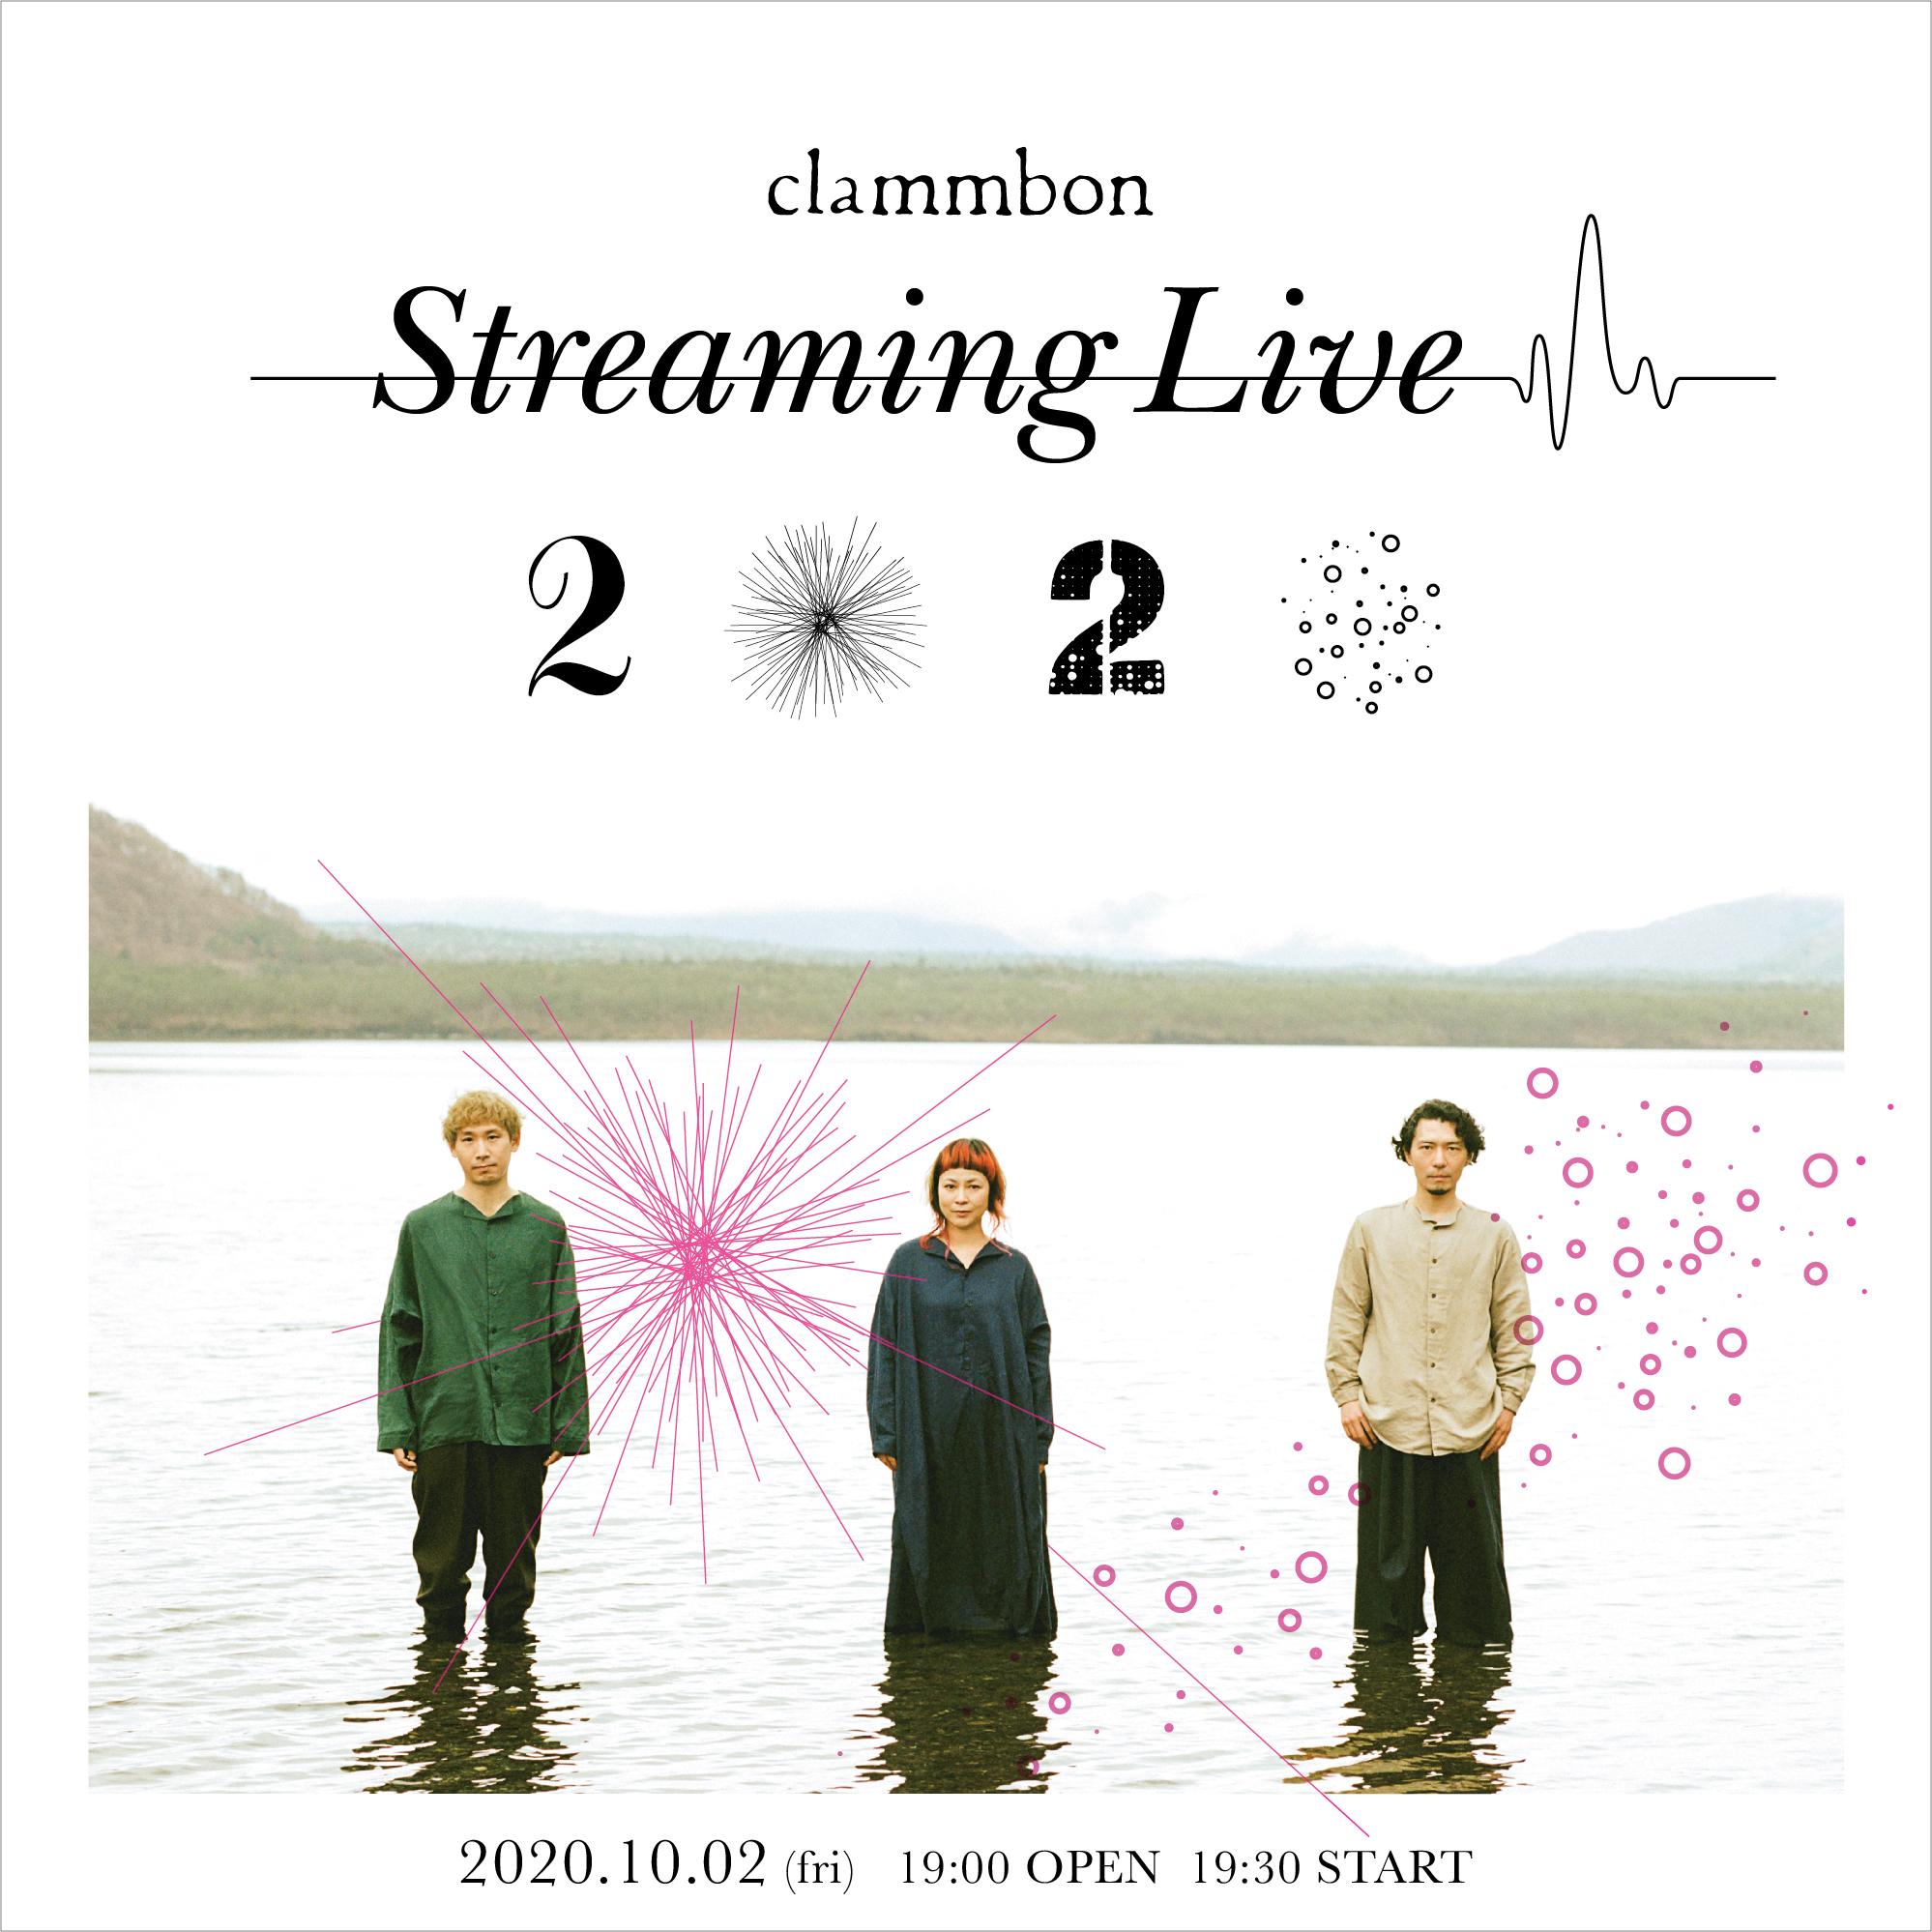 2020_clammbon_StreamingLive.jpg